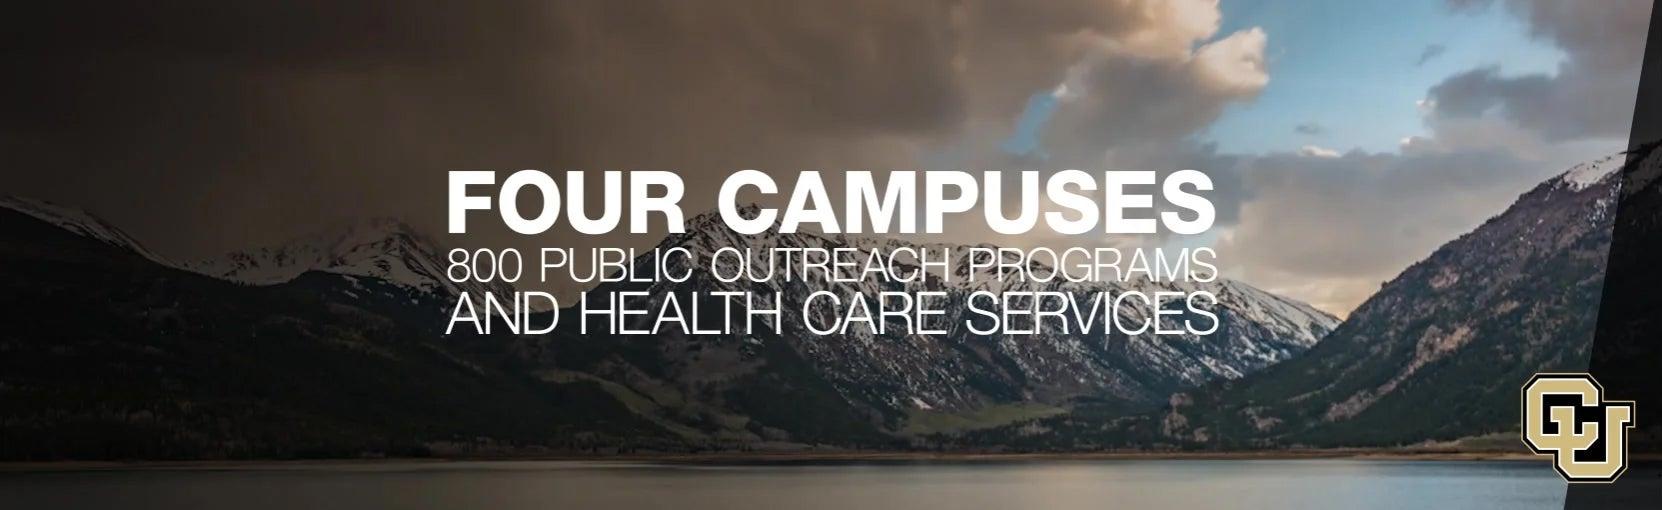 University of Colorado |